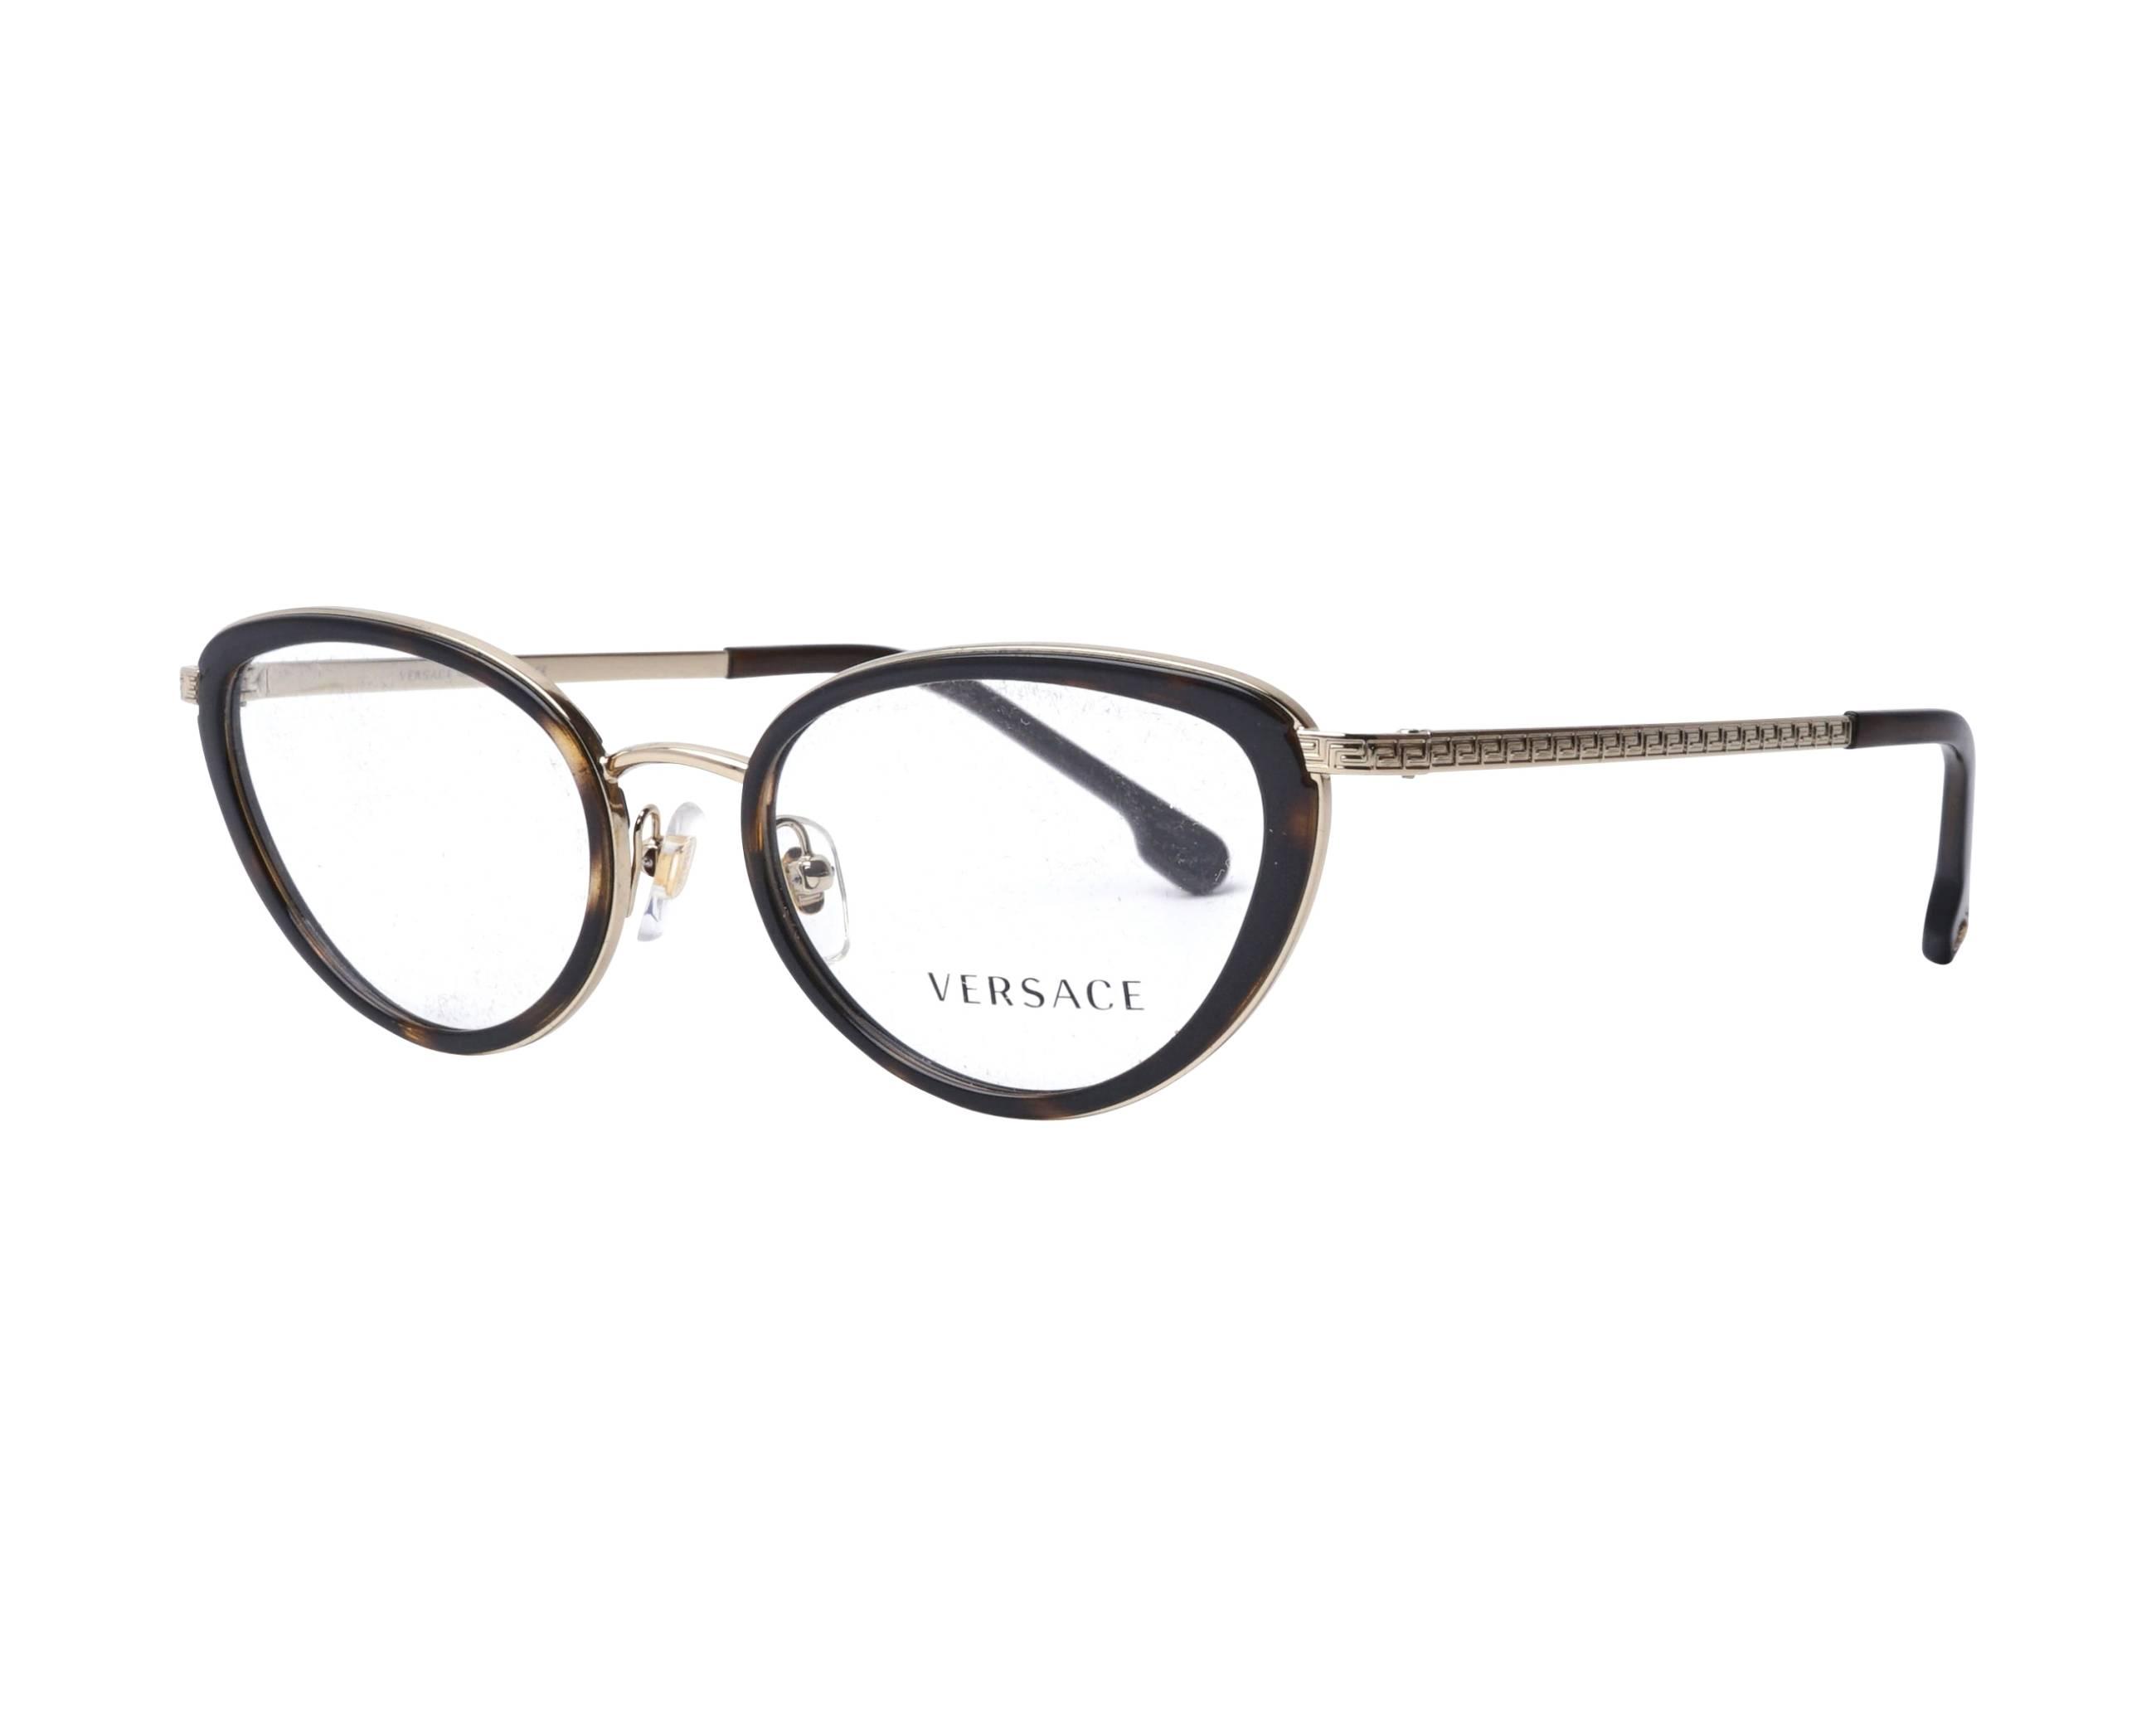 2e4468f05d eyeglasses Versace VE-1258 1440 52-19 Havana Gold profile view